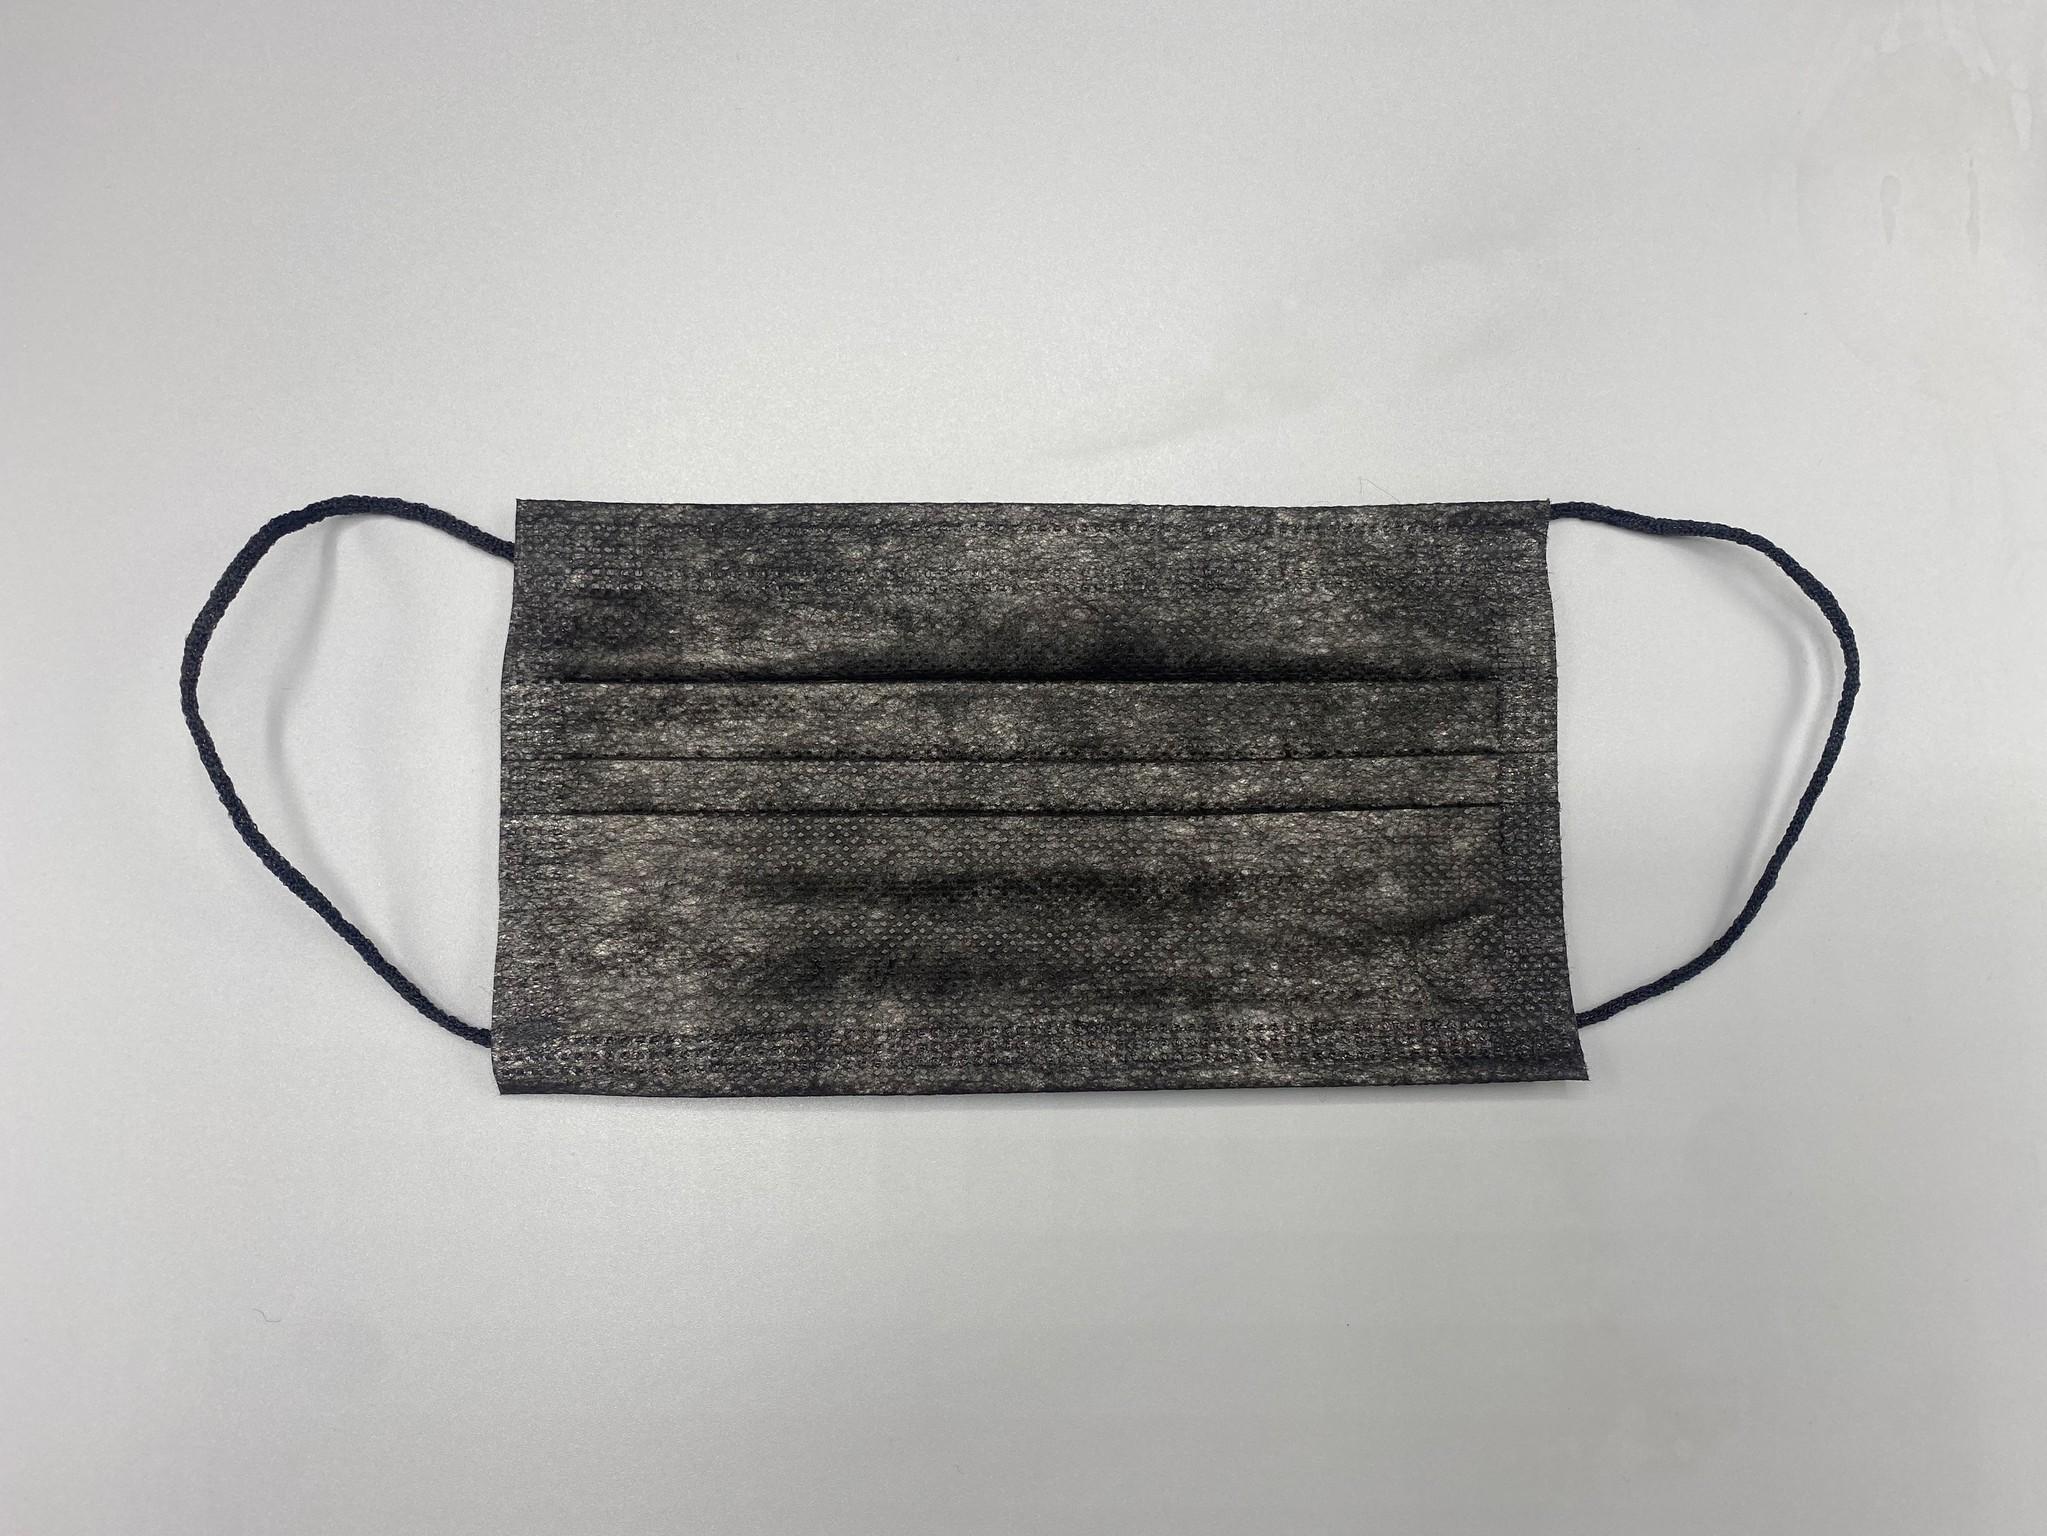 Surgical masks - Verdent - EN 14683 Type IIR - Black